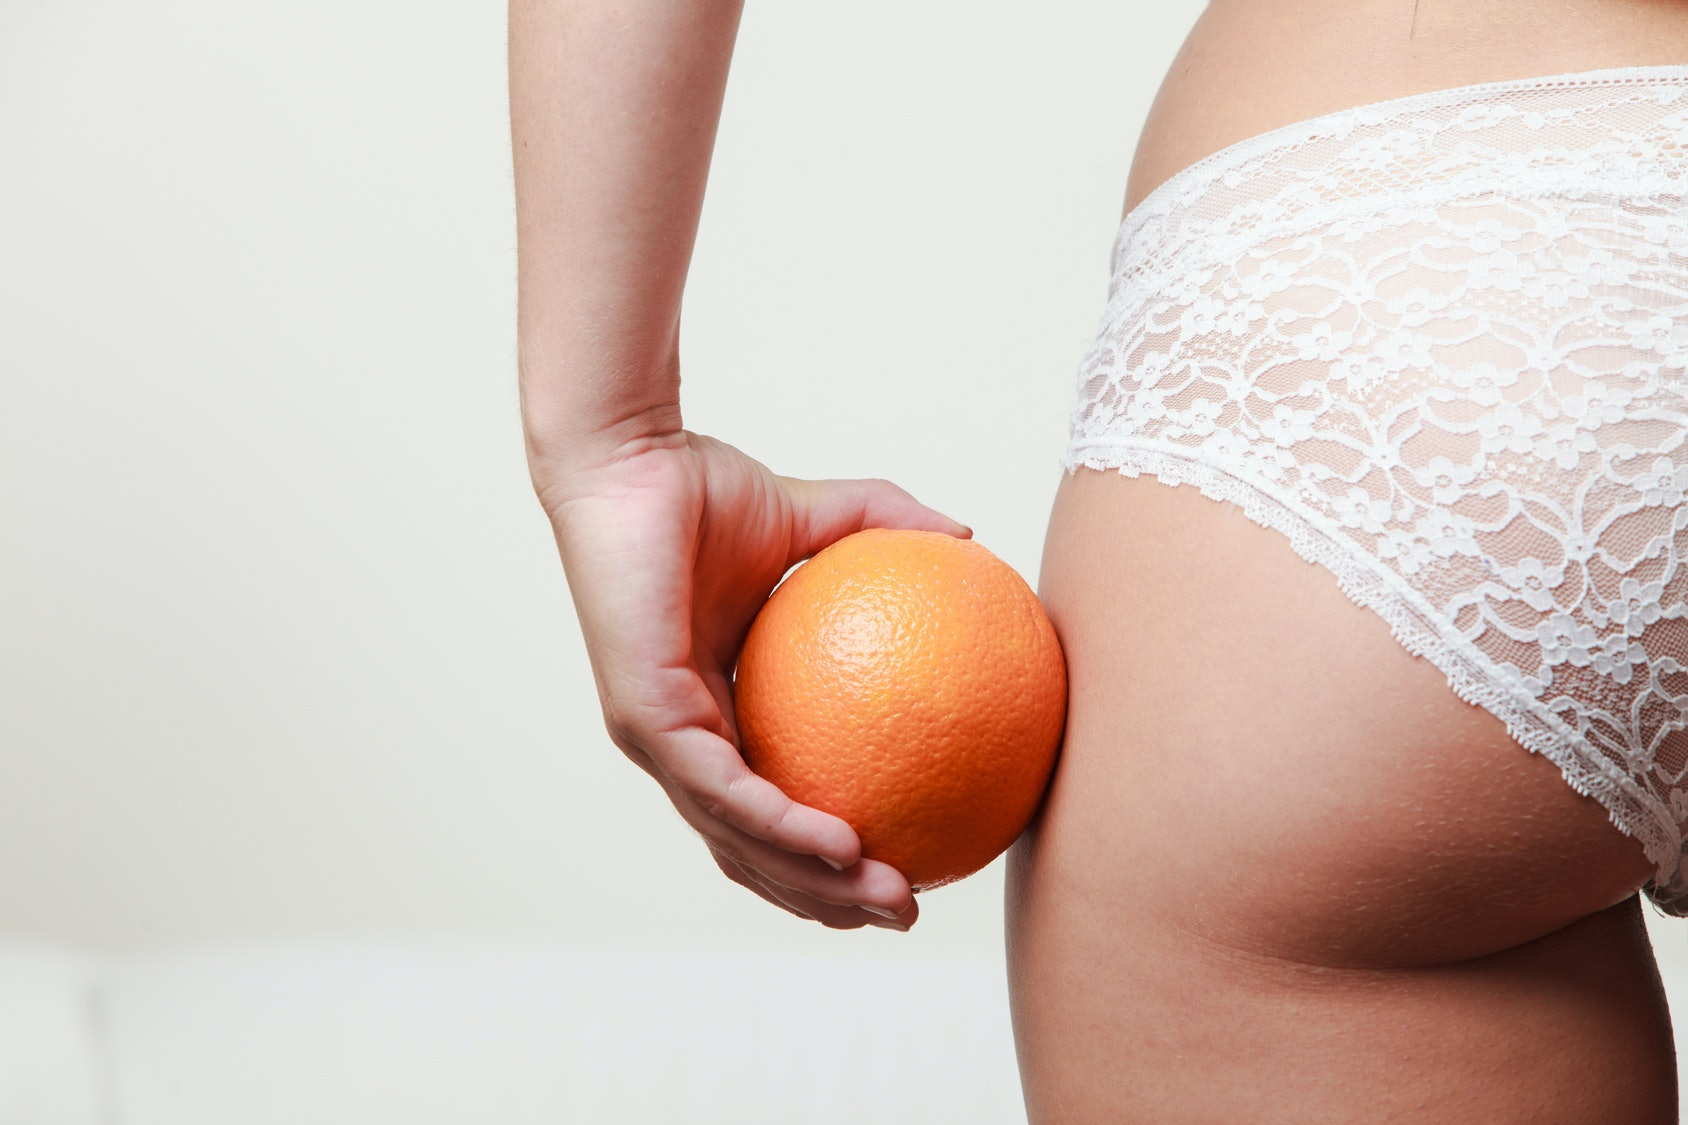 Co woman like anal inercorse